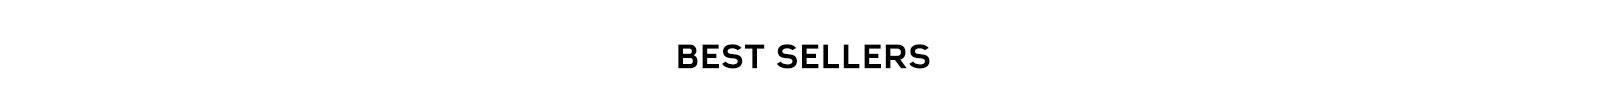 shiseido flagship 2019: bestsellers